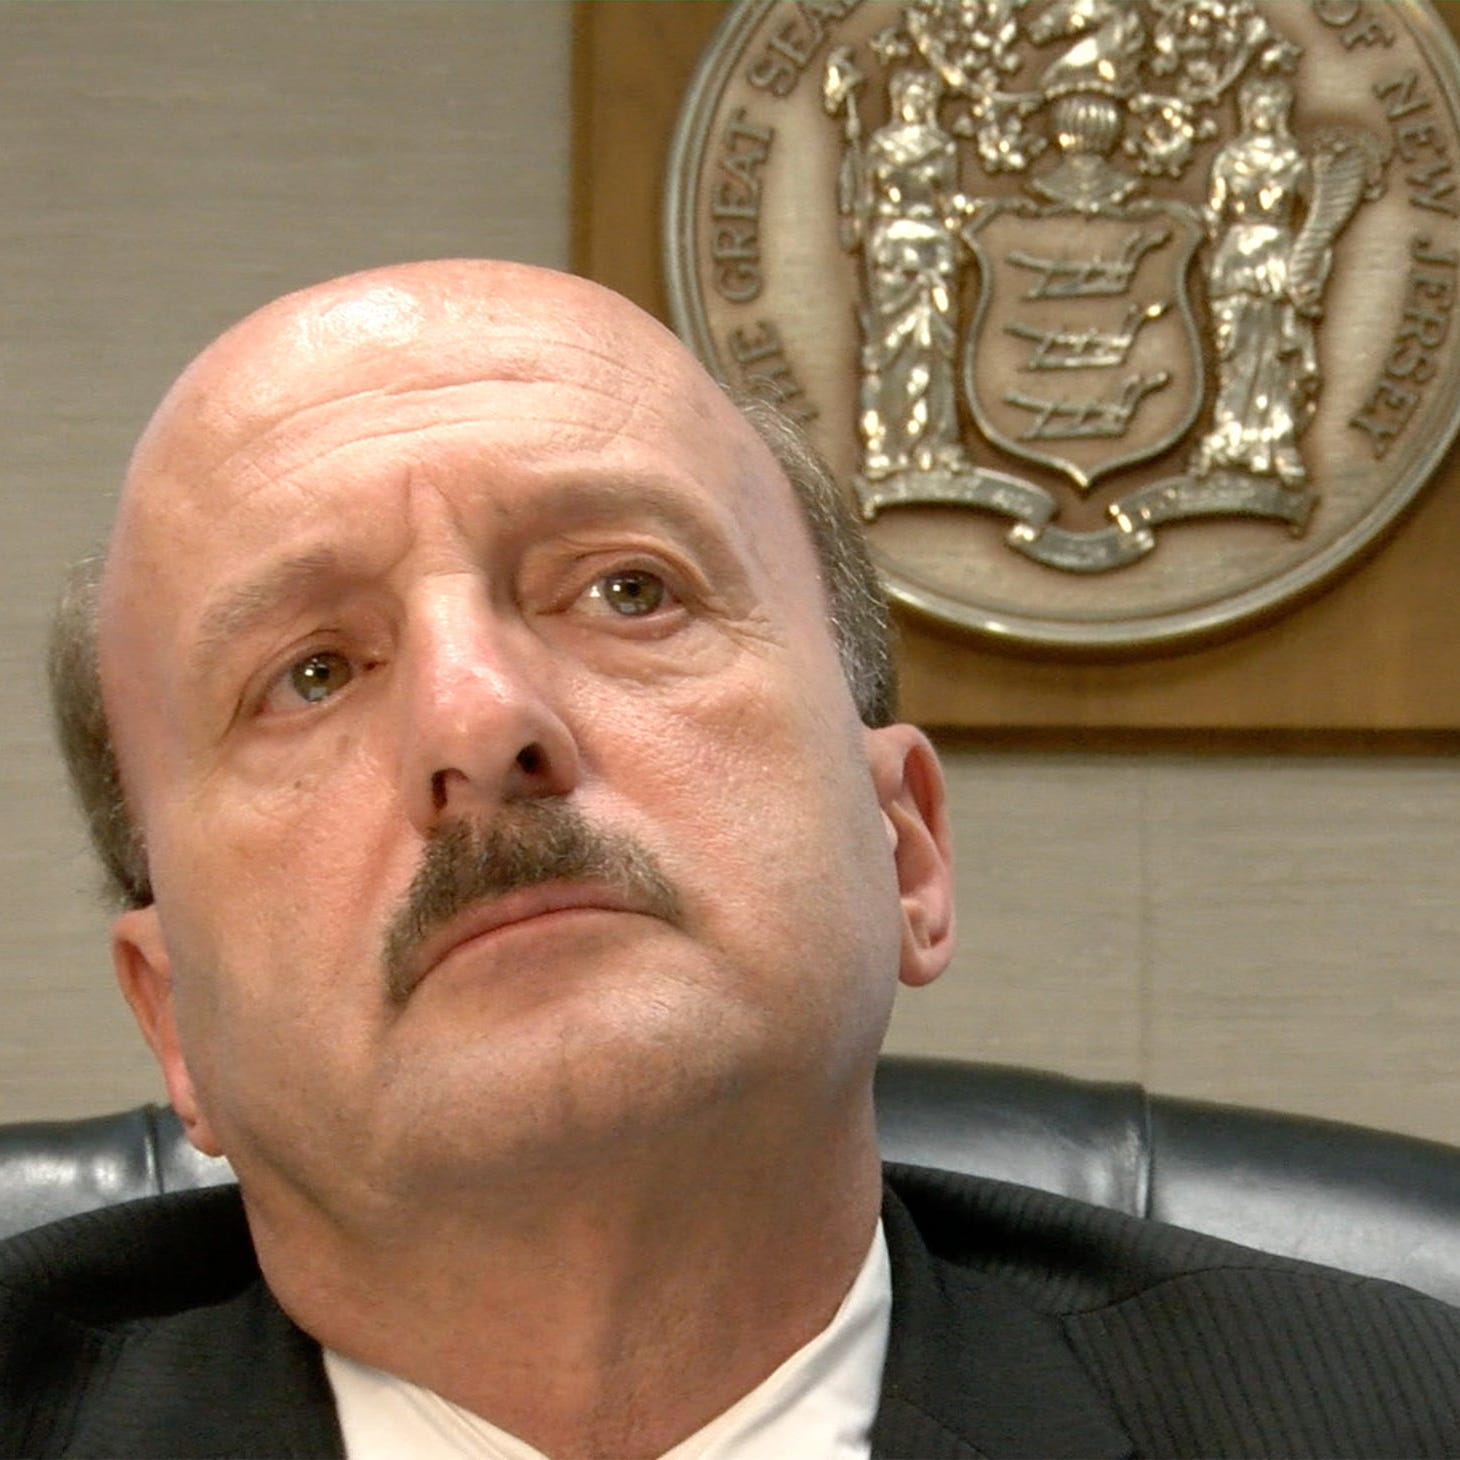 Prosecutor's Facebook tiff exposes poor loser: Bergmann